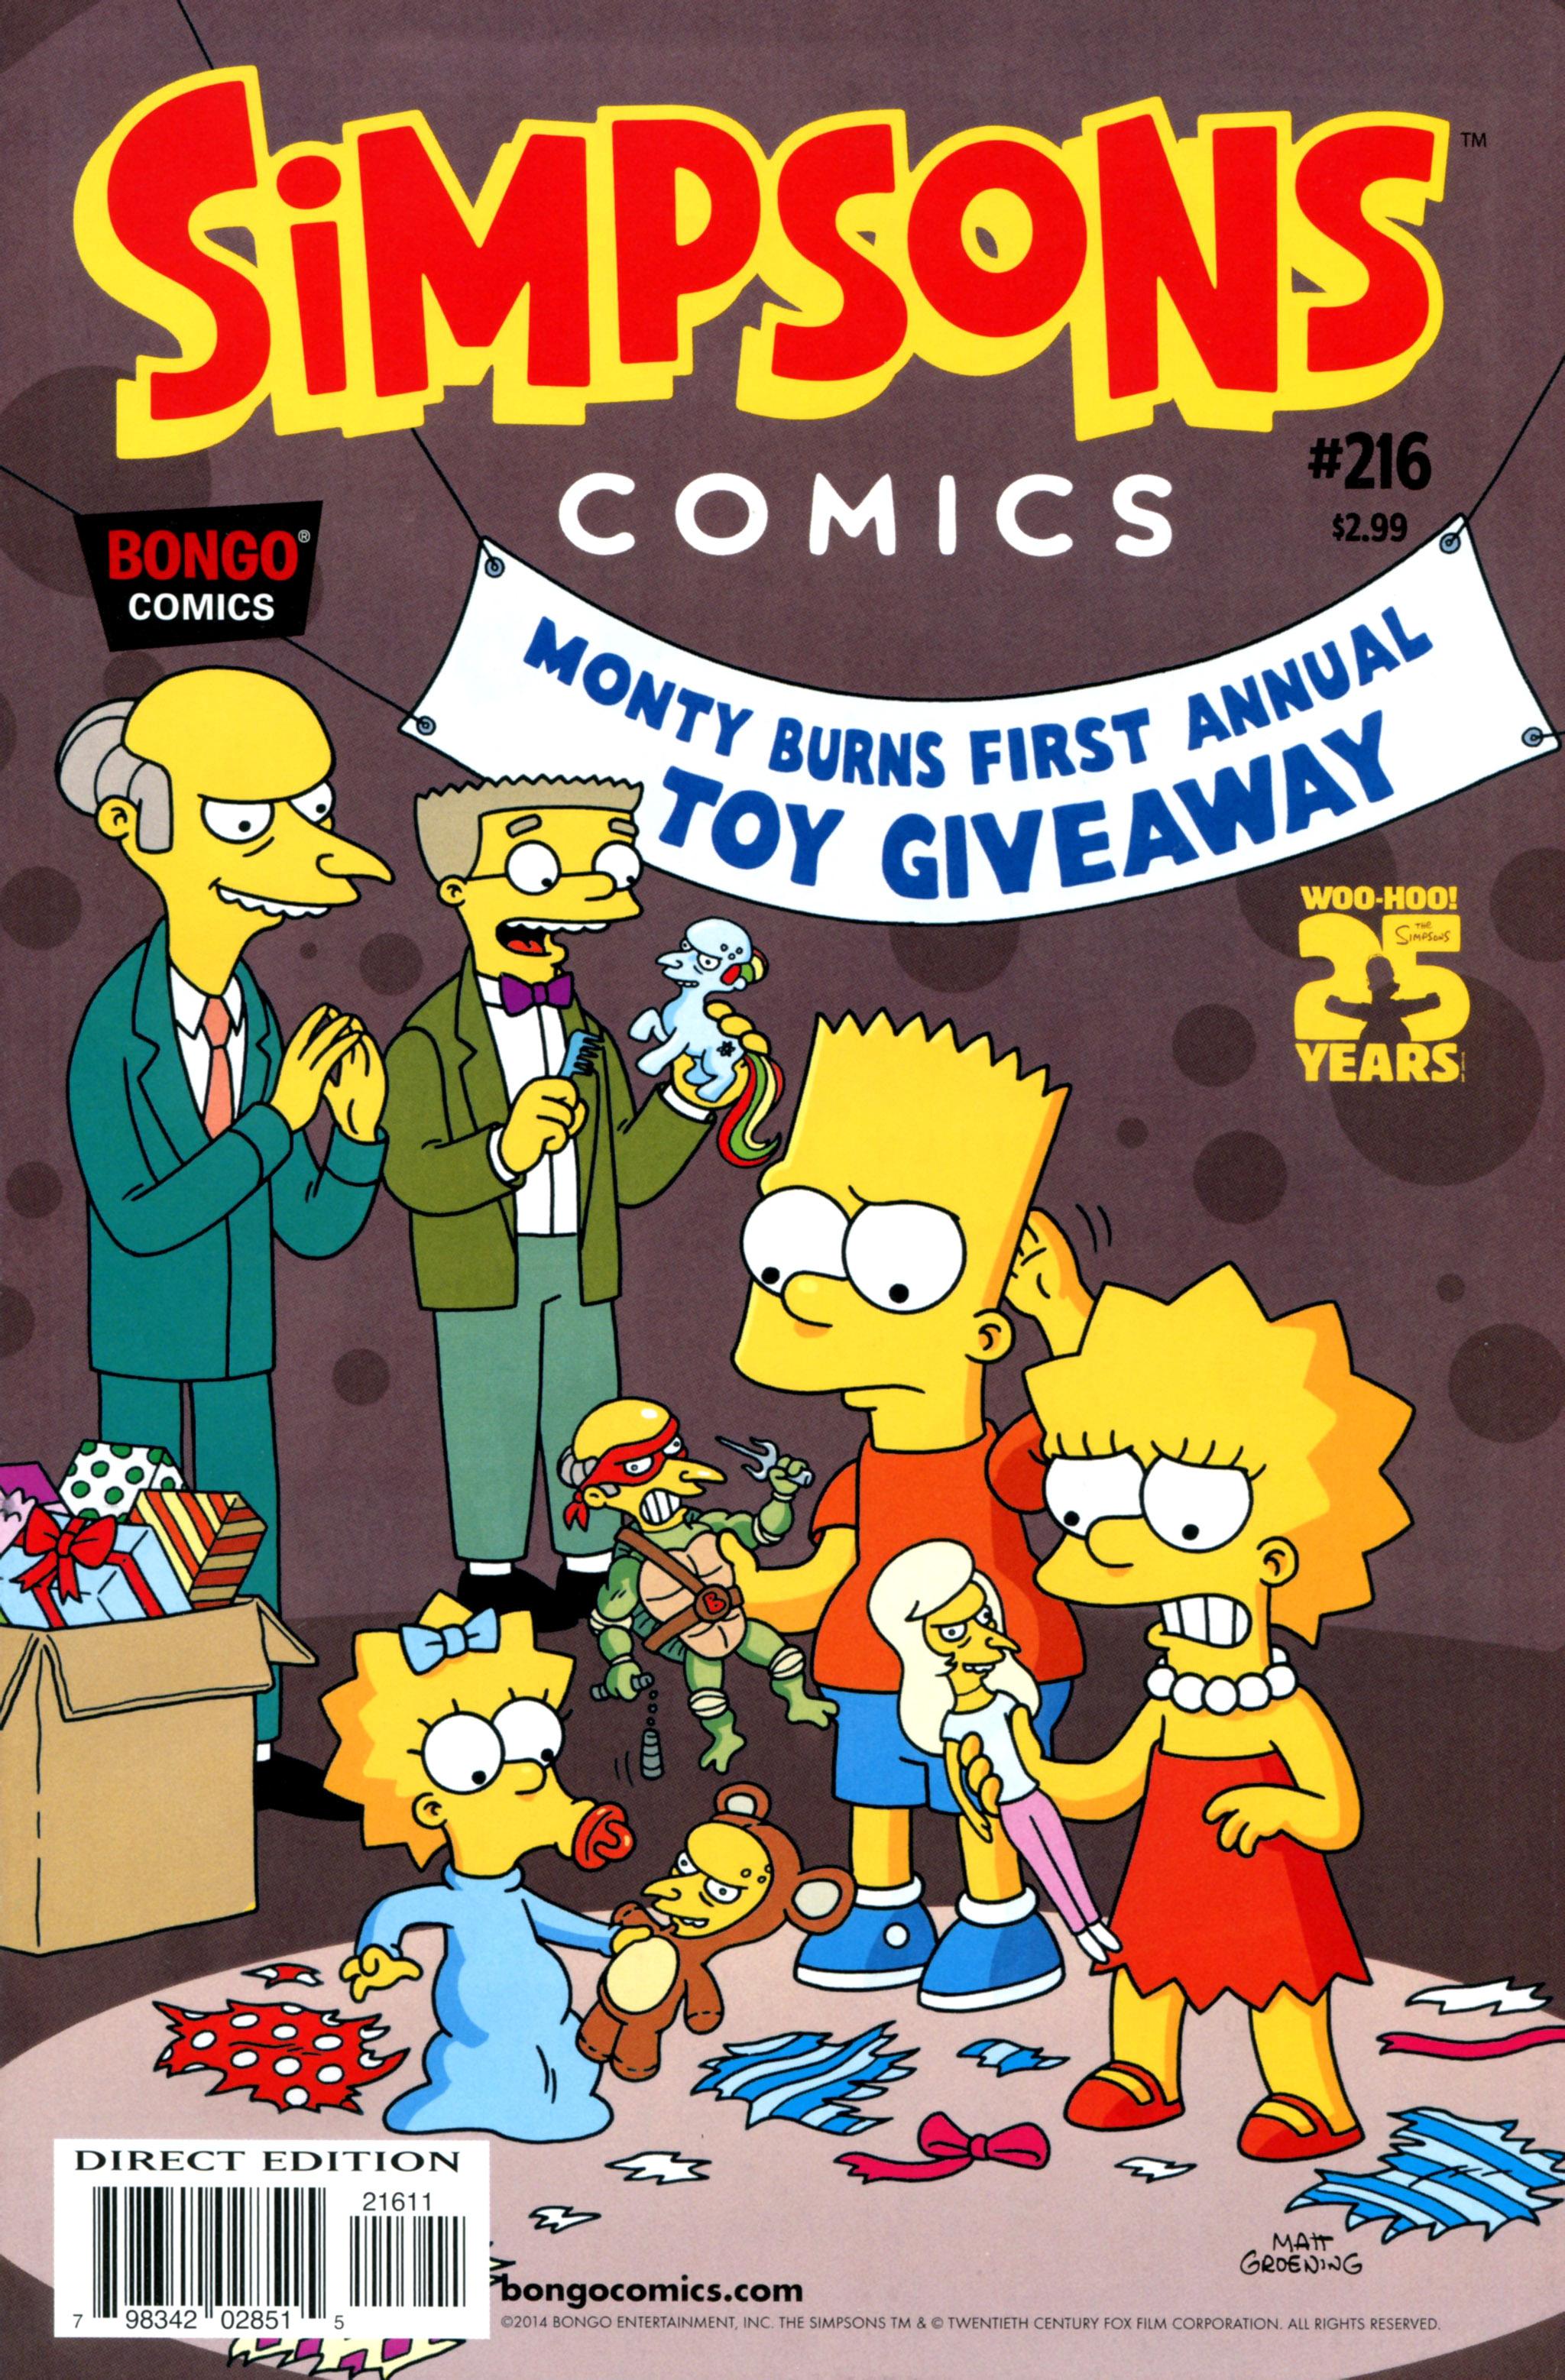 Simpsons Comics 216 Page 1